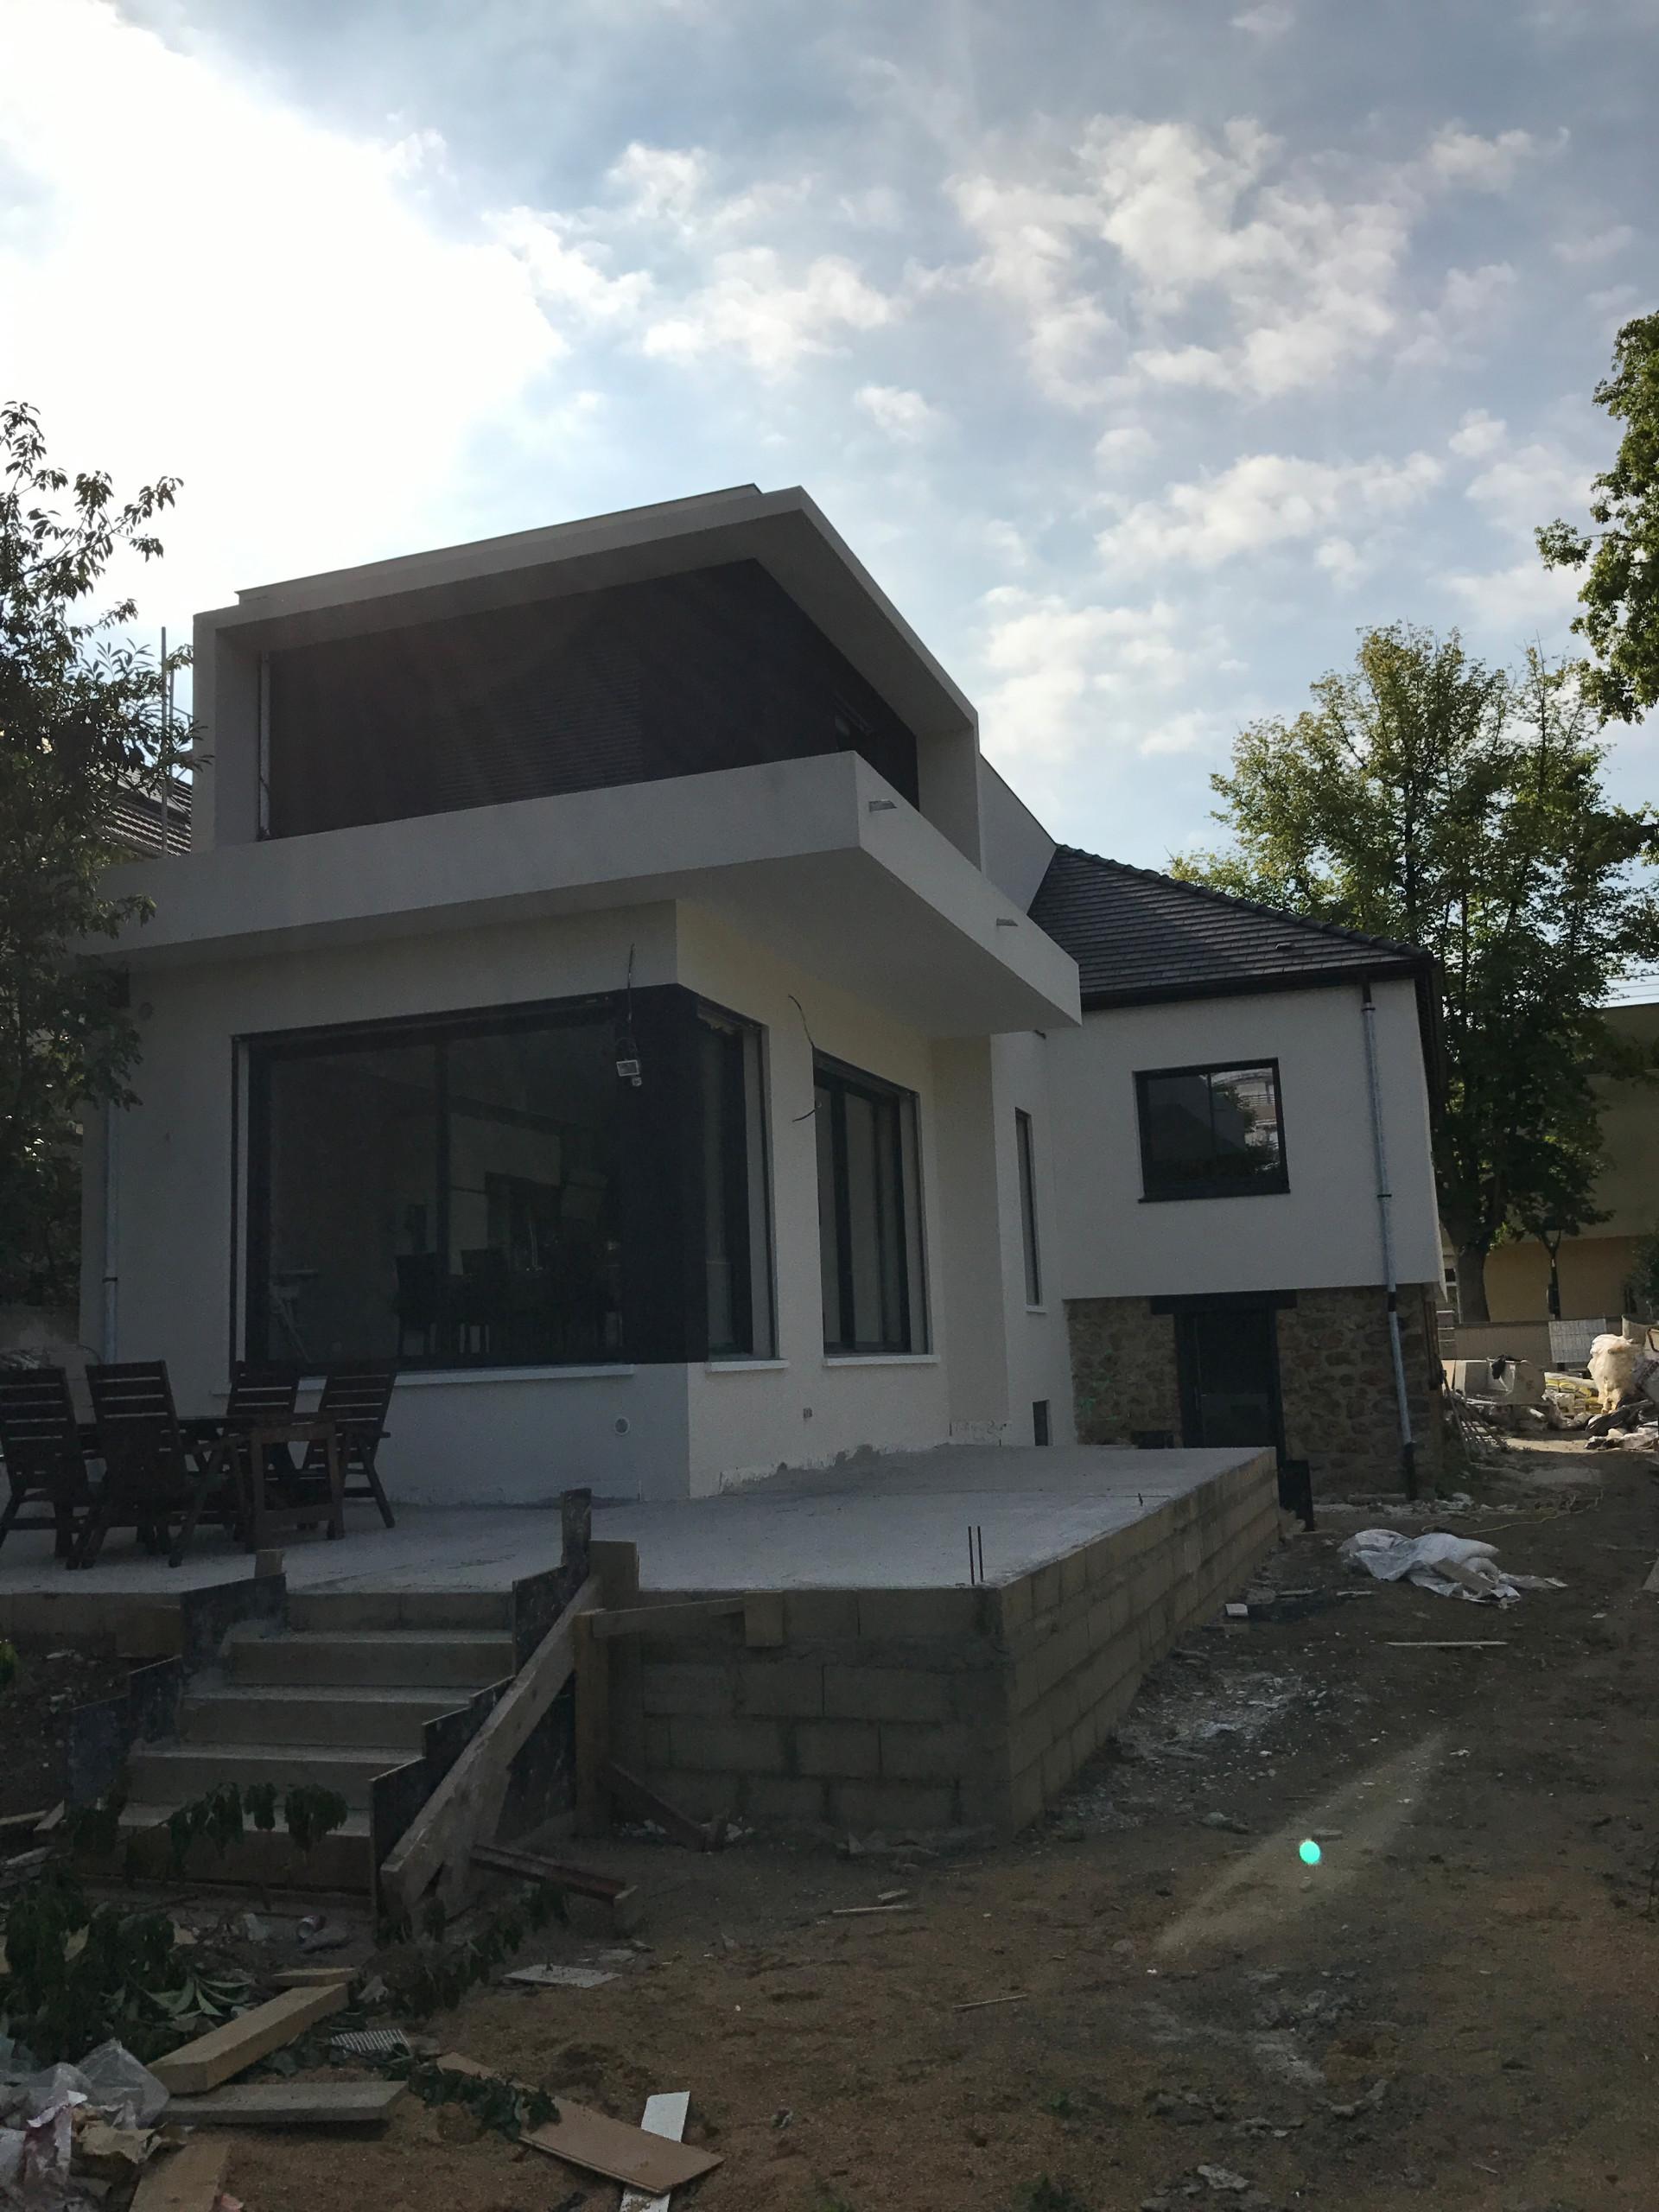 Agrandissement & rénovation | Seine-et-Marne